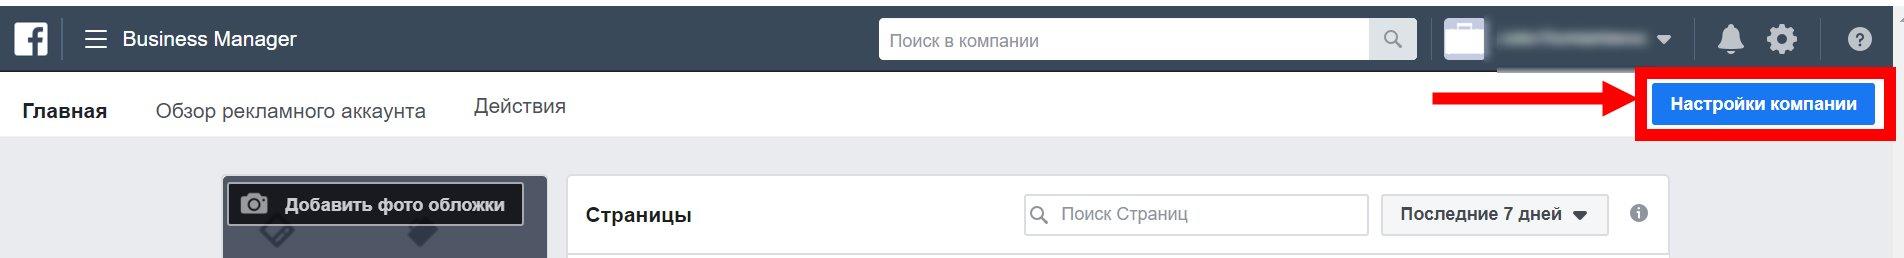 FB_kak_priviazat_inst19.jpg